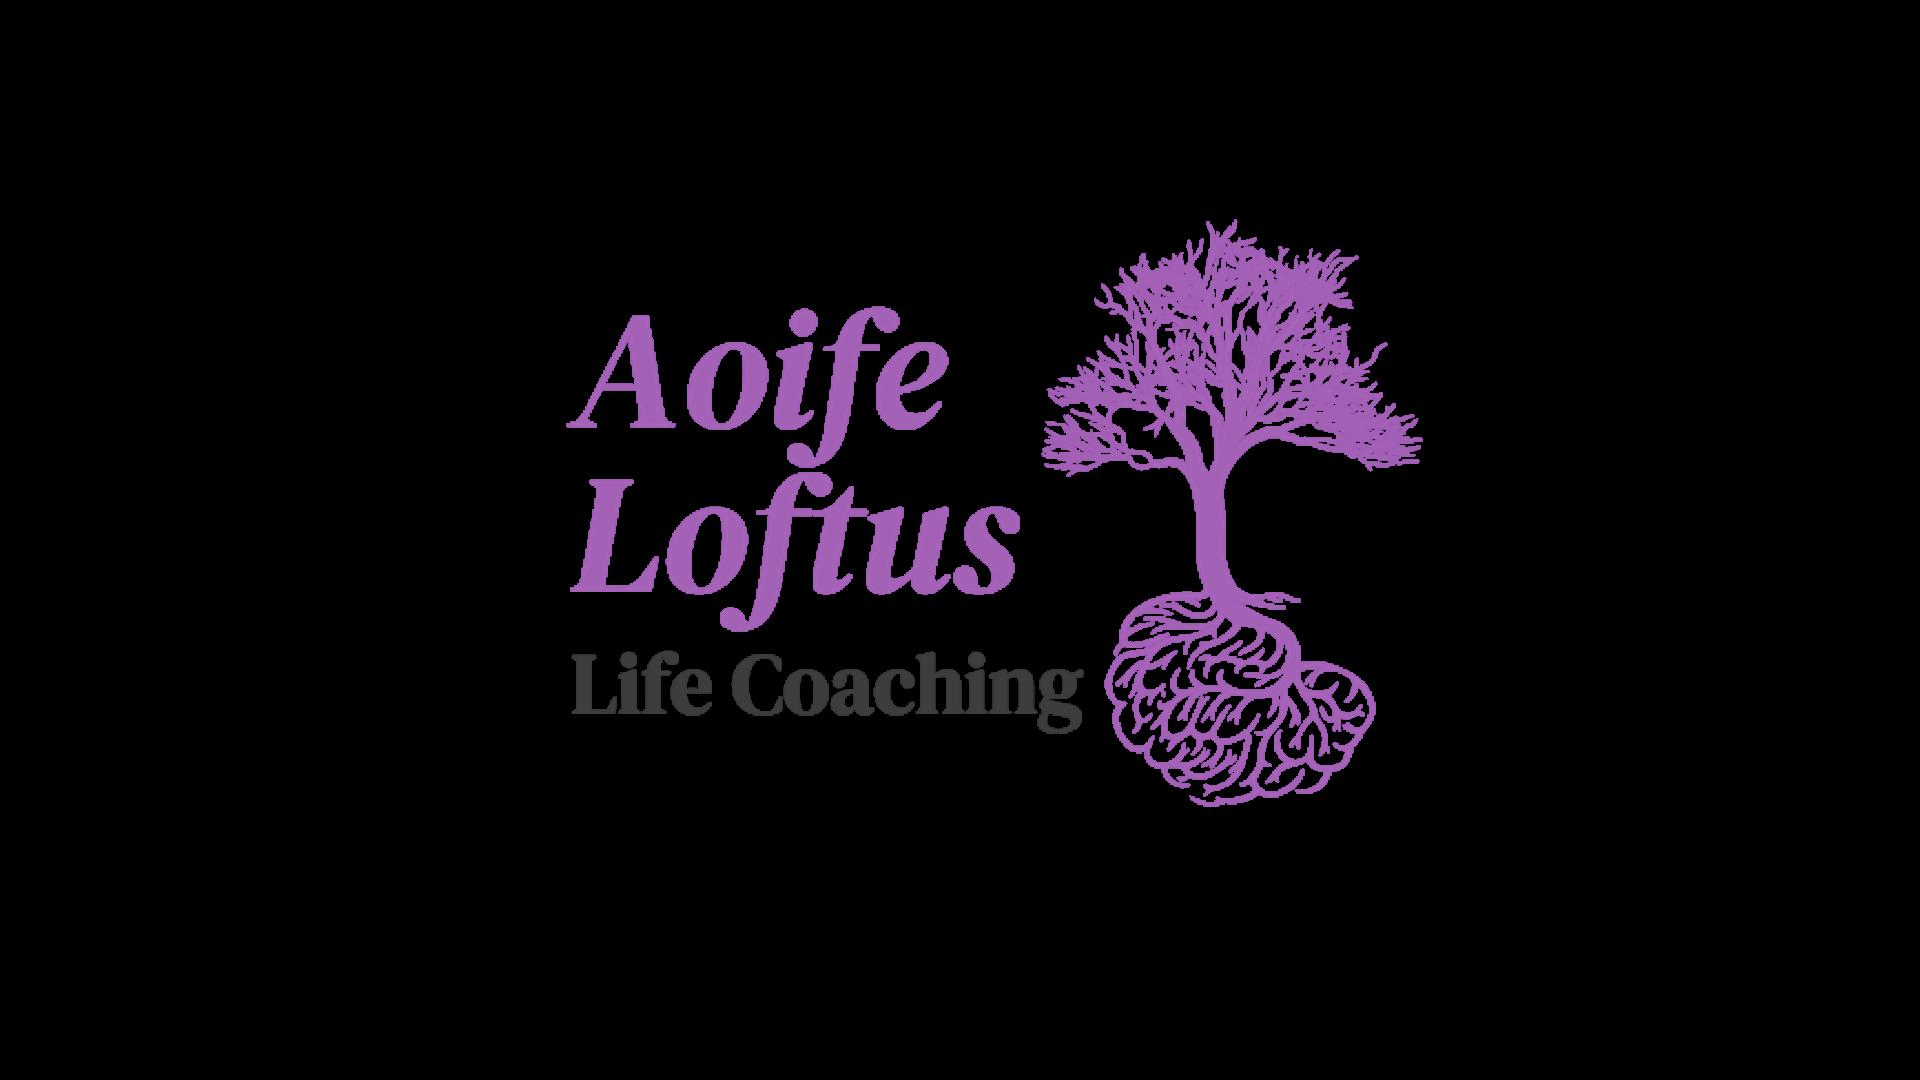 Aoife Loftus Life Coaching